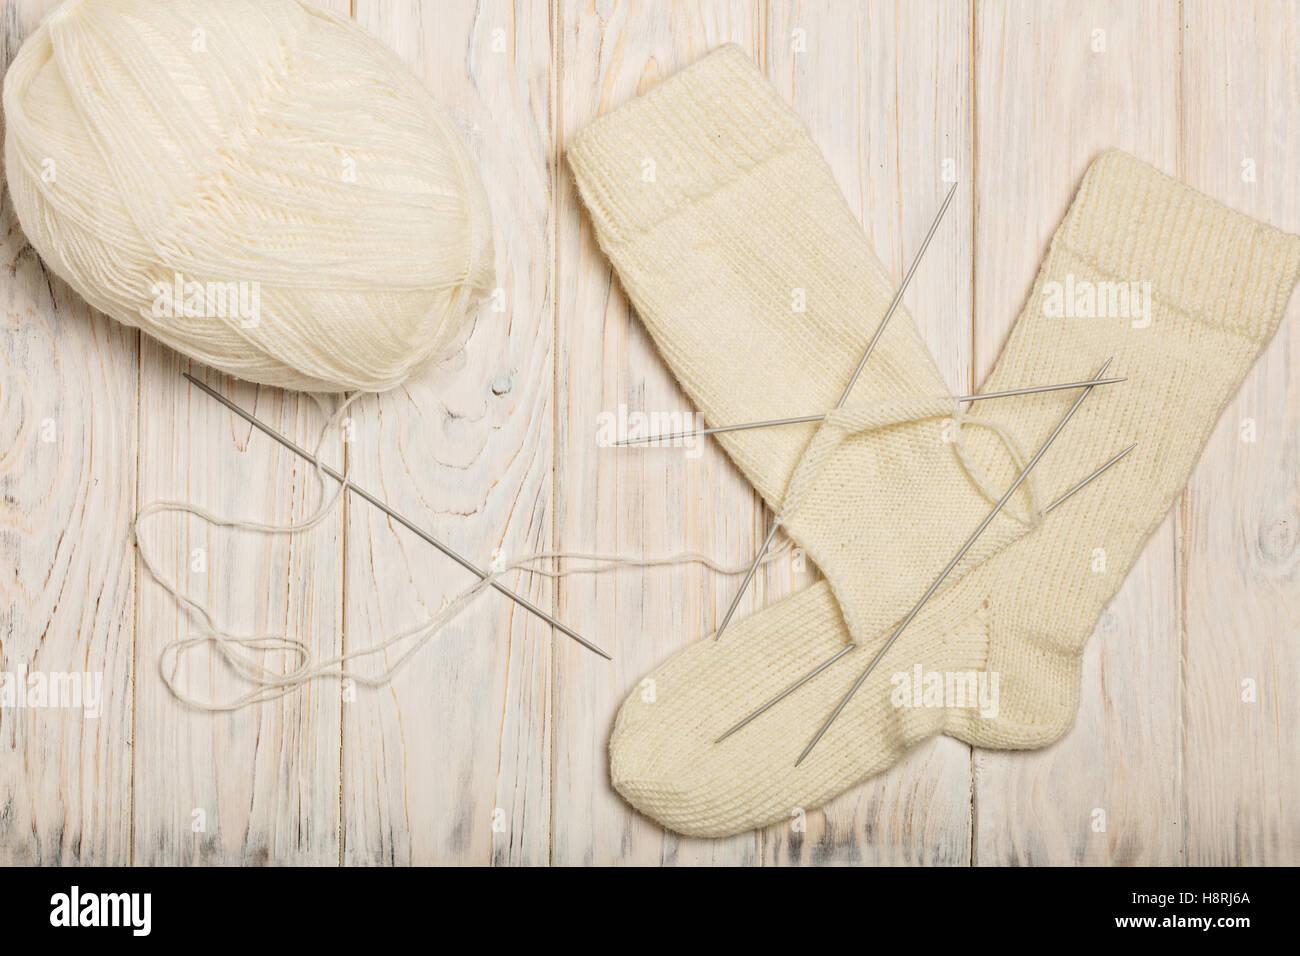 Vintage Socks Imágenes De Stock & Vintage Socks Fotos De Stock - Alamy